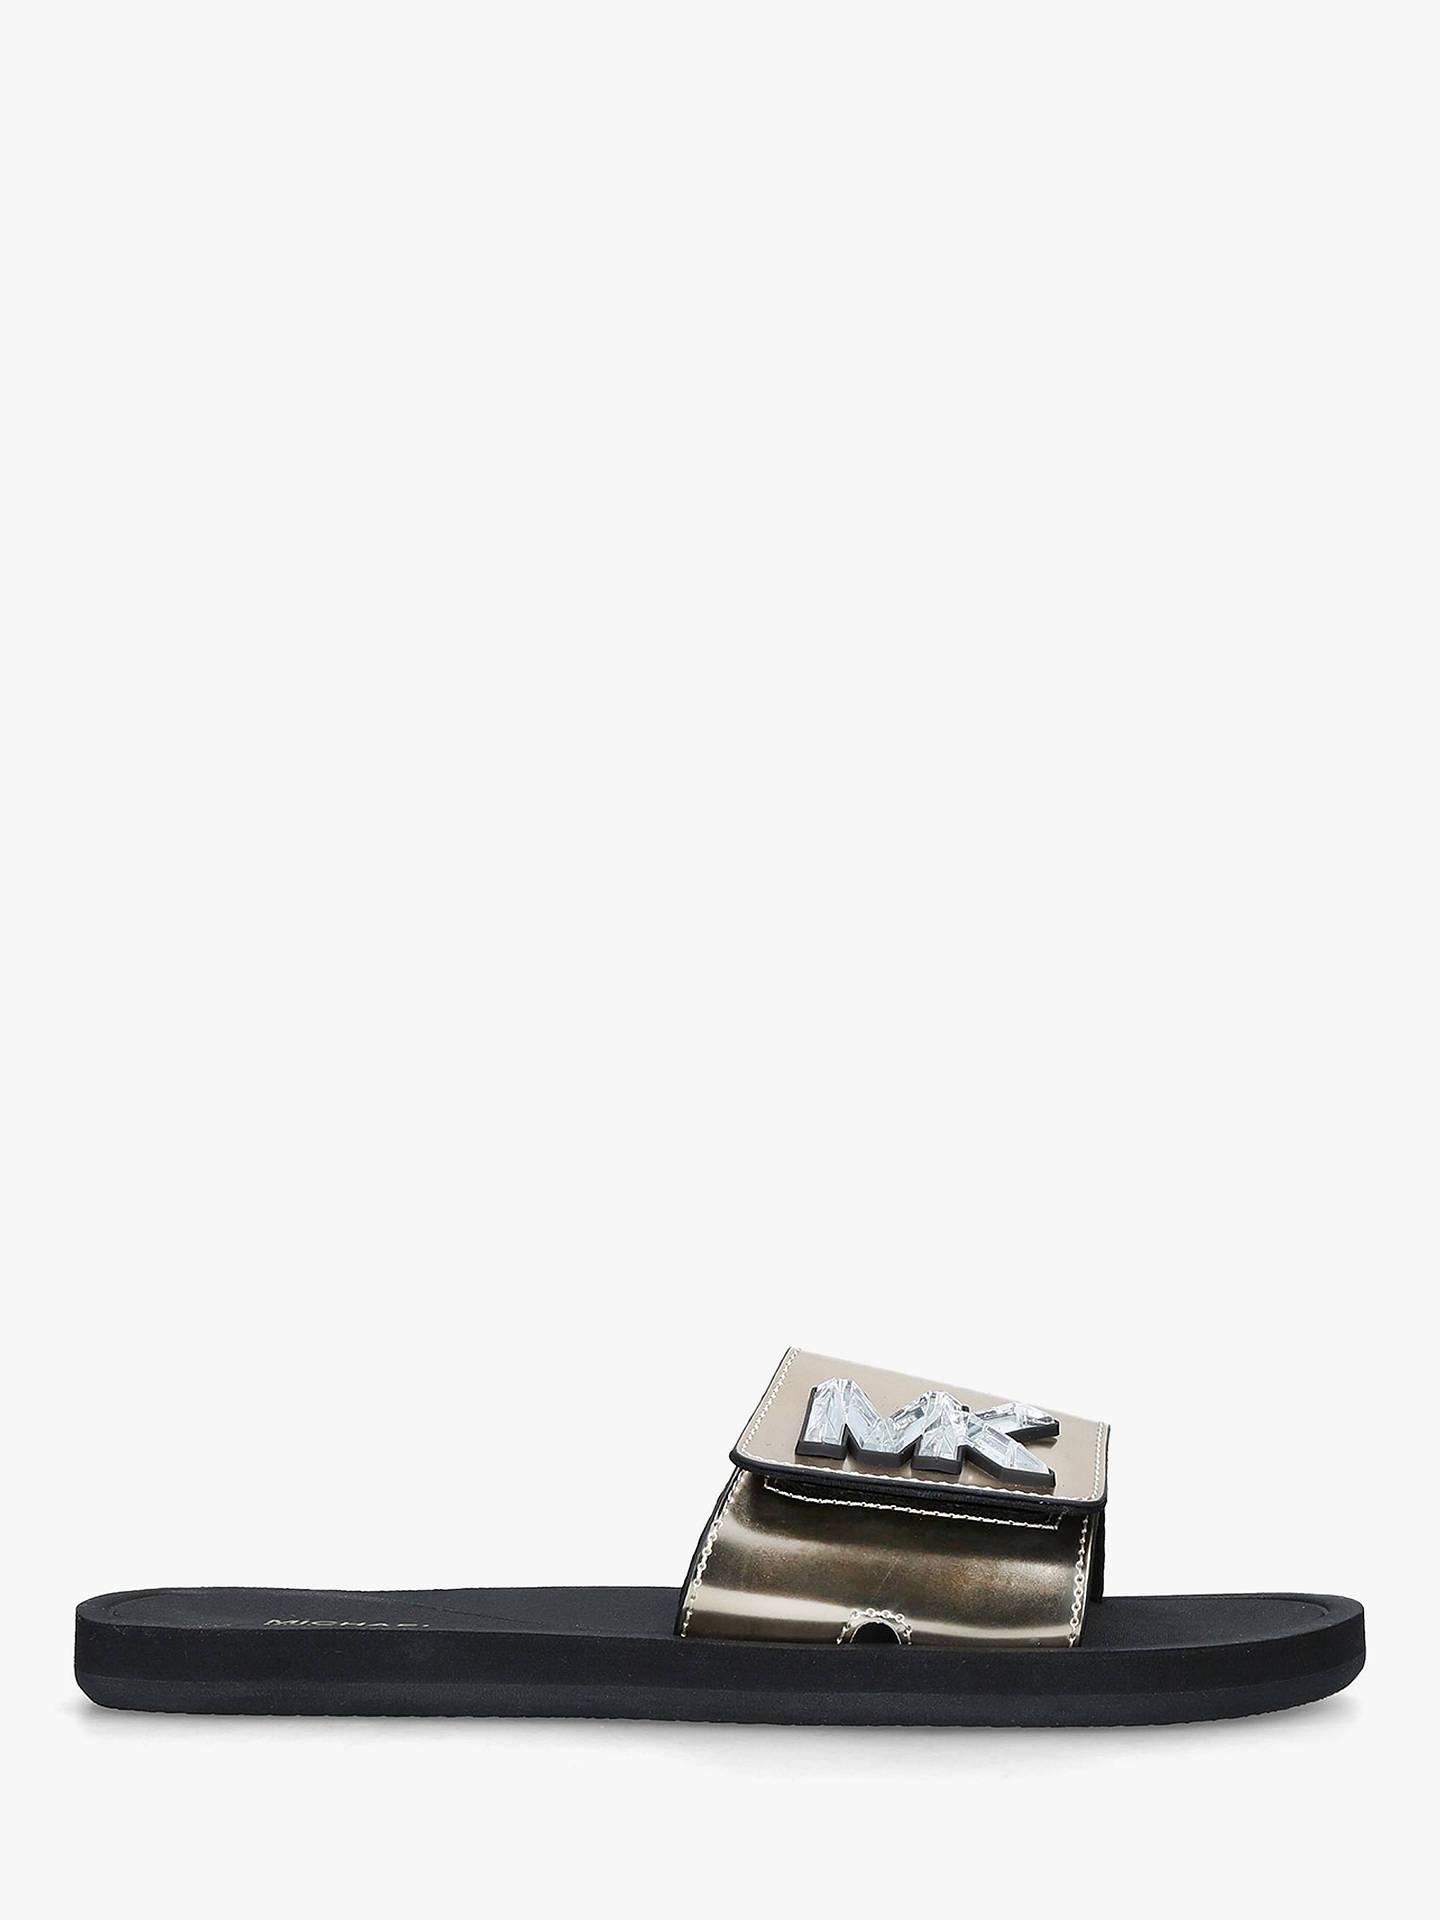 951148c7e6d84 MICHAEL Michael Kors Monogram Slide Sandals, Gold